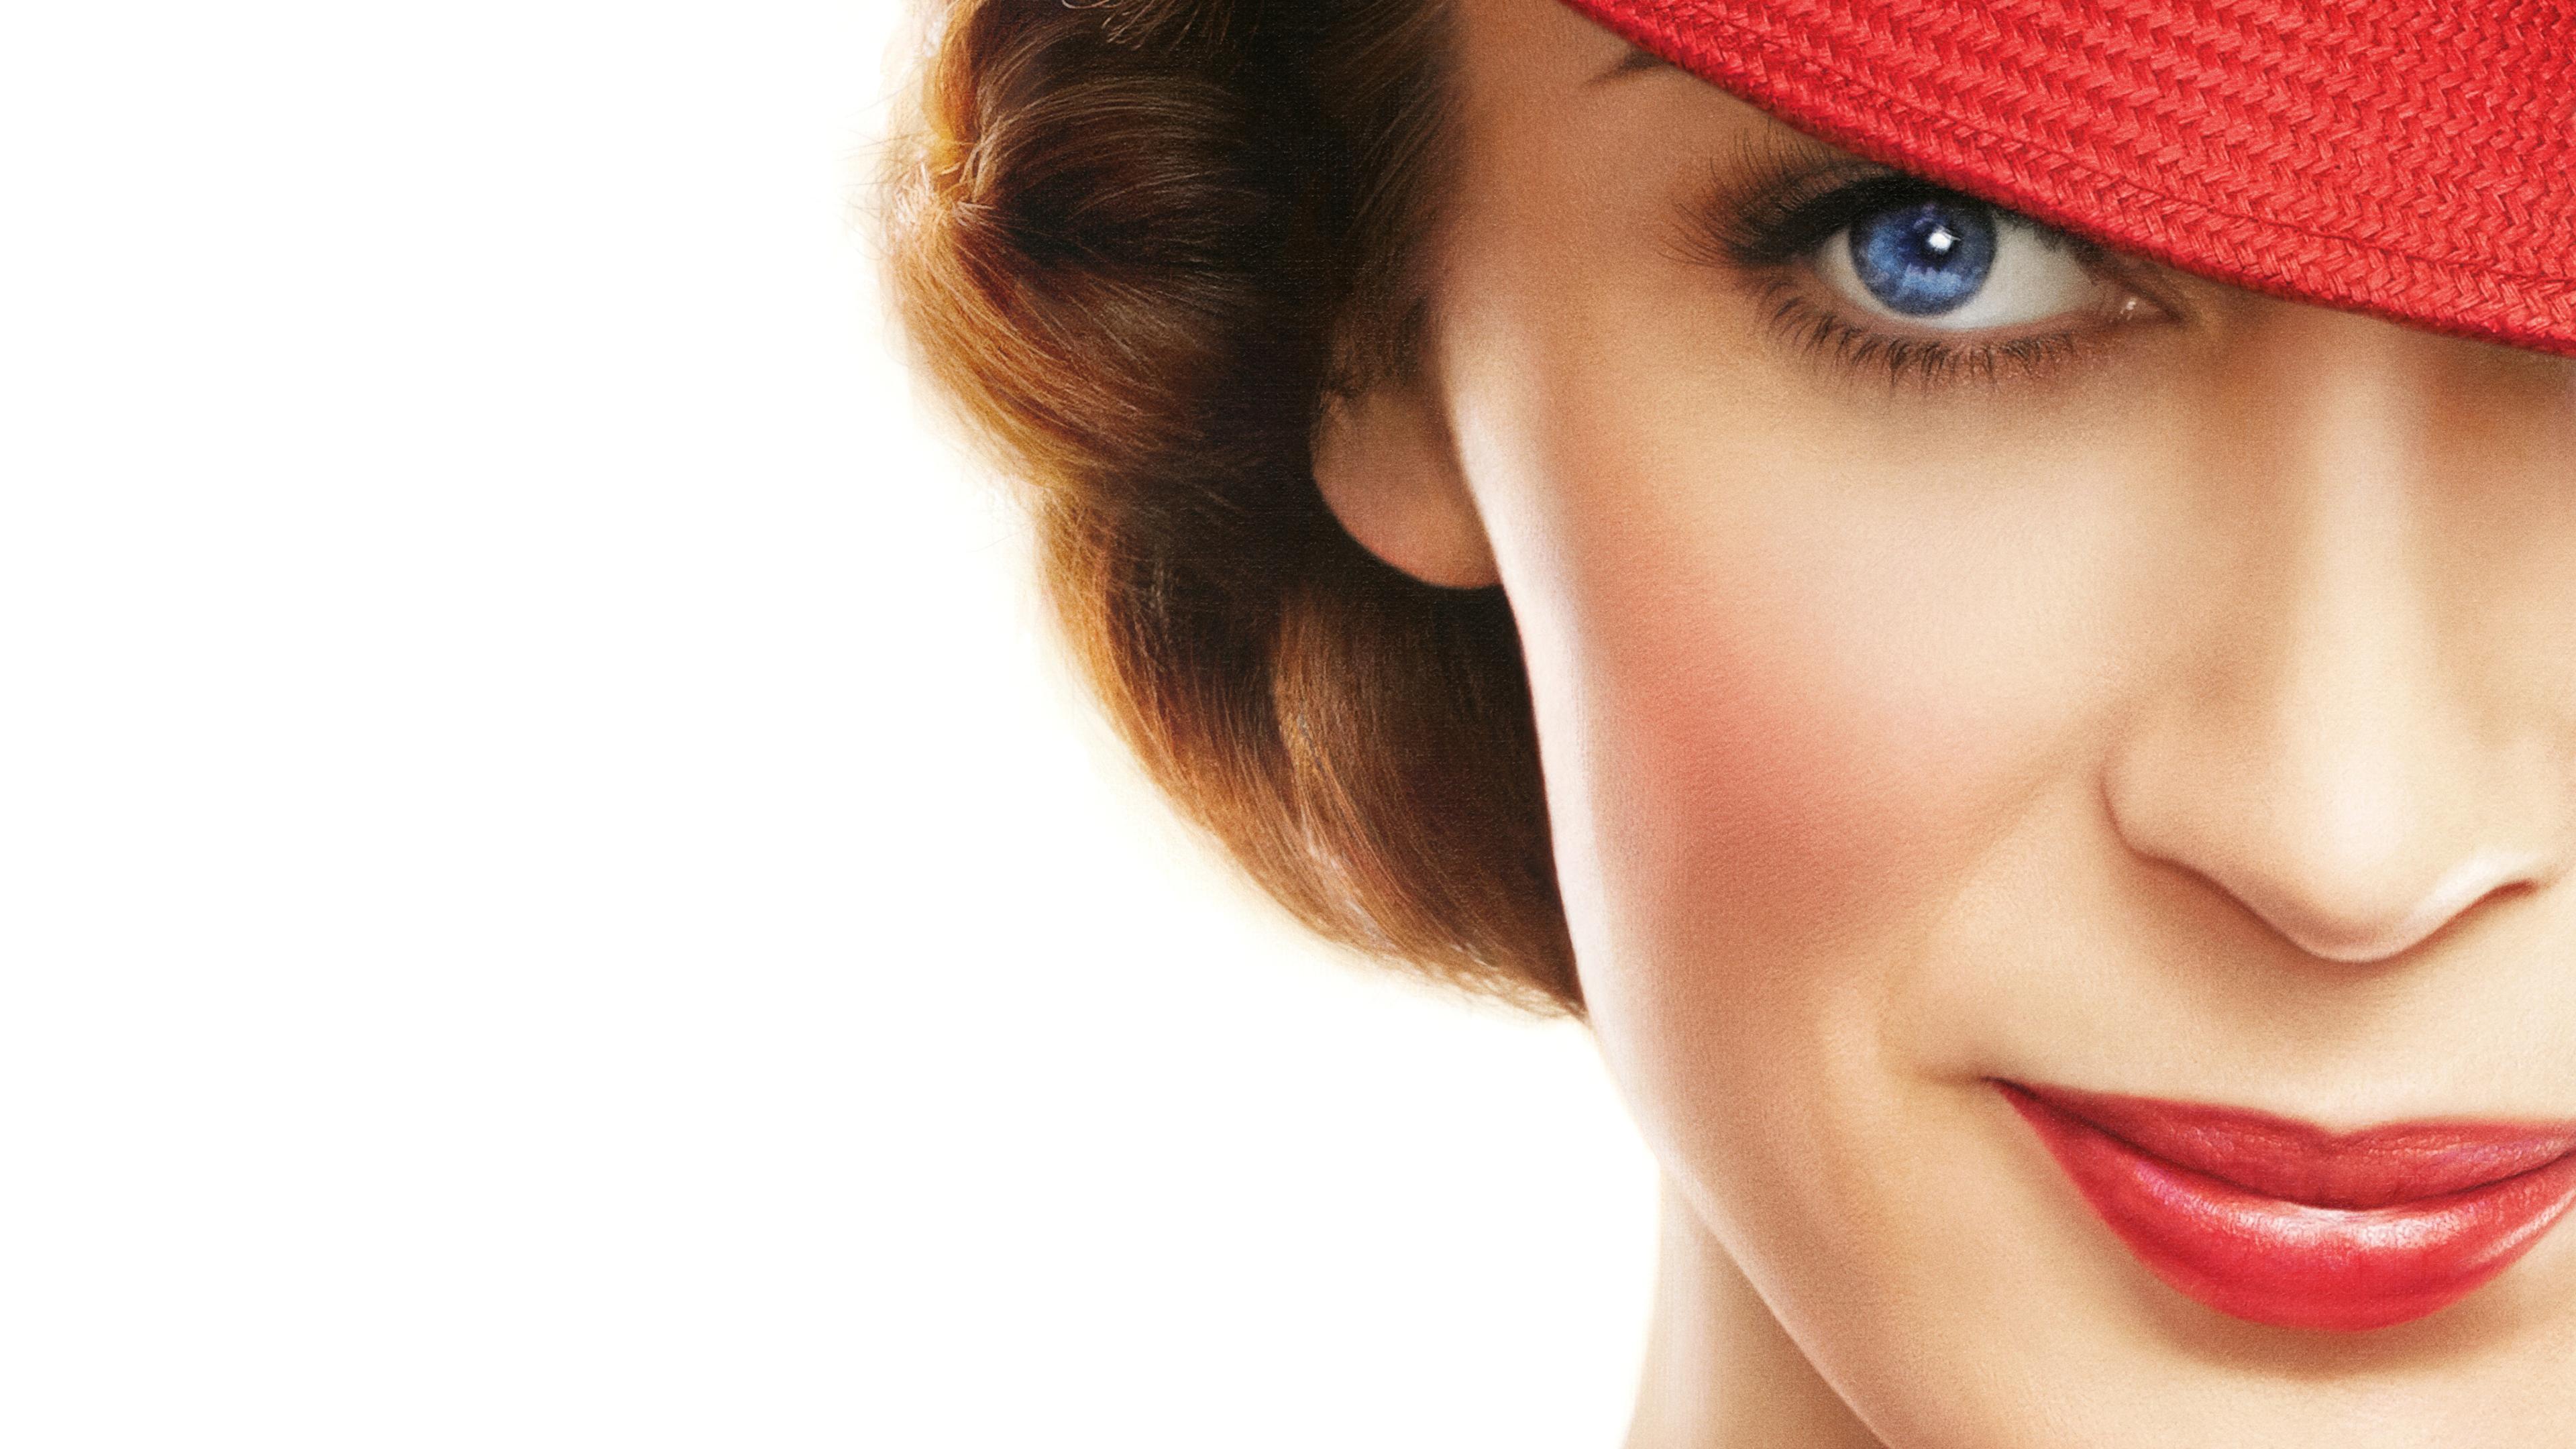 mary poppins returns 5k 1539979685 - Mary Poppins Returns 5k - movies wallpapers, mary poppins returns wallpapers, hd-wallpapers, emily blunt wallpapers, 5k wallpapers, 4k-wallpapers, 2018-movies-wallpapers